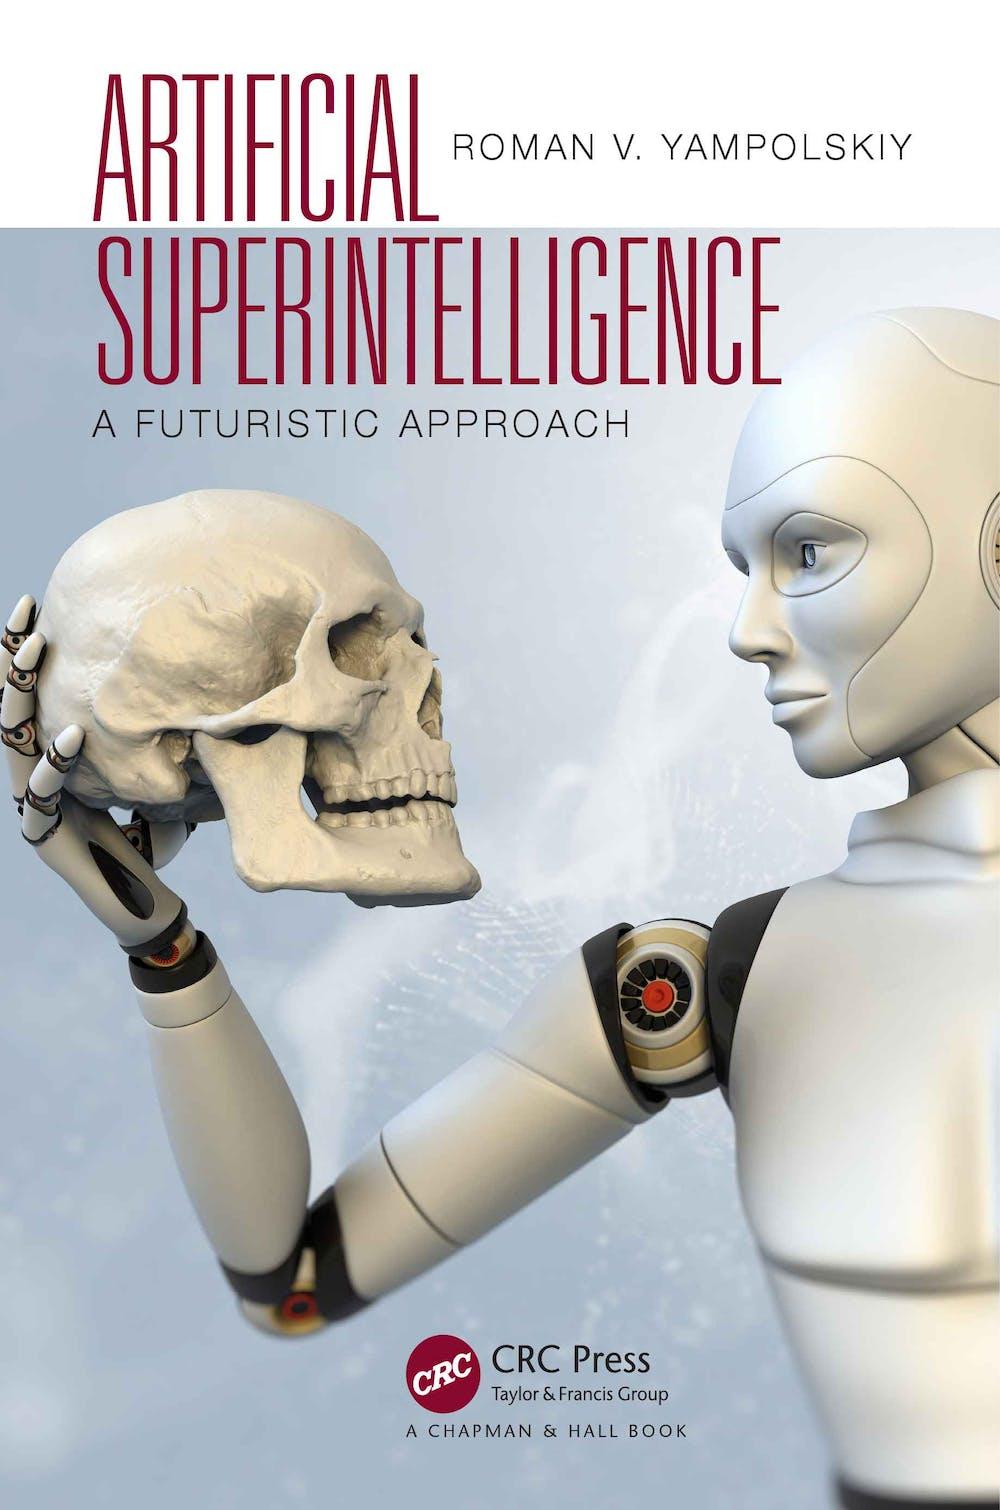 Fighting malevolent AI: artificial intelligence, meet